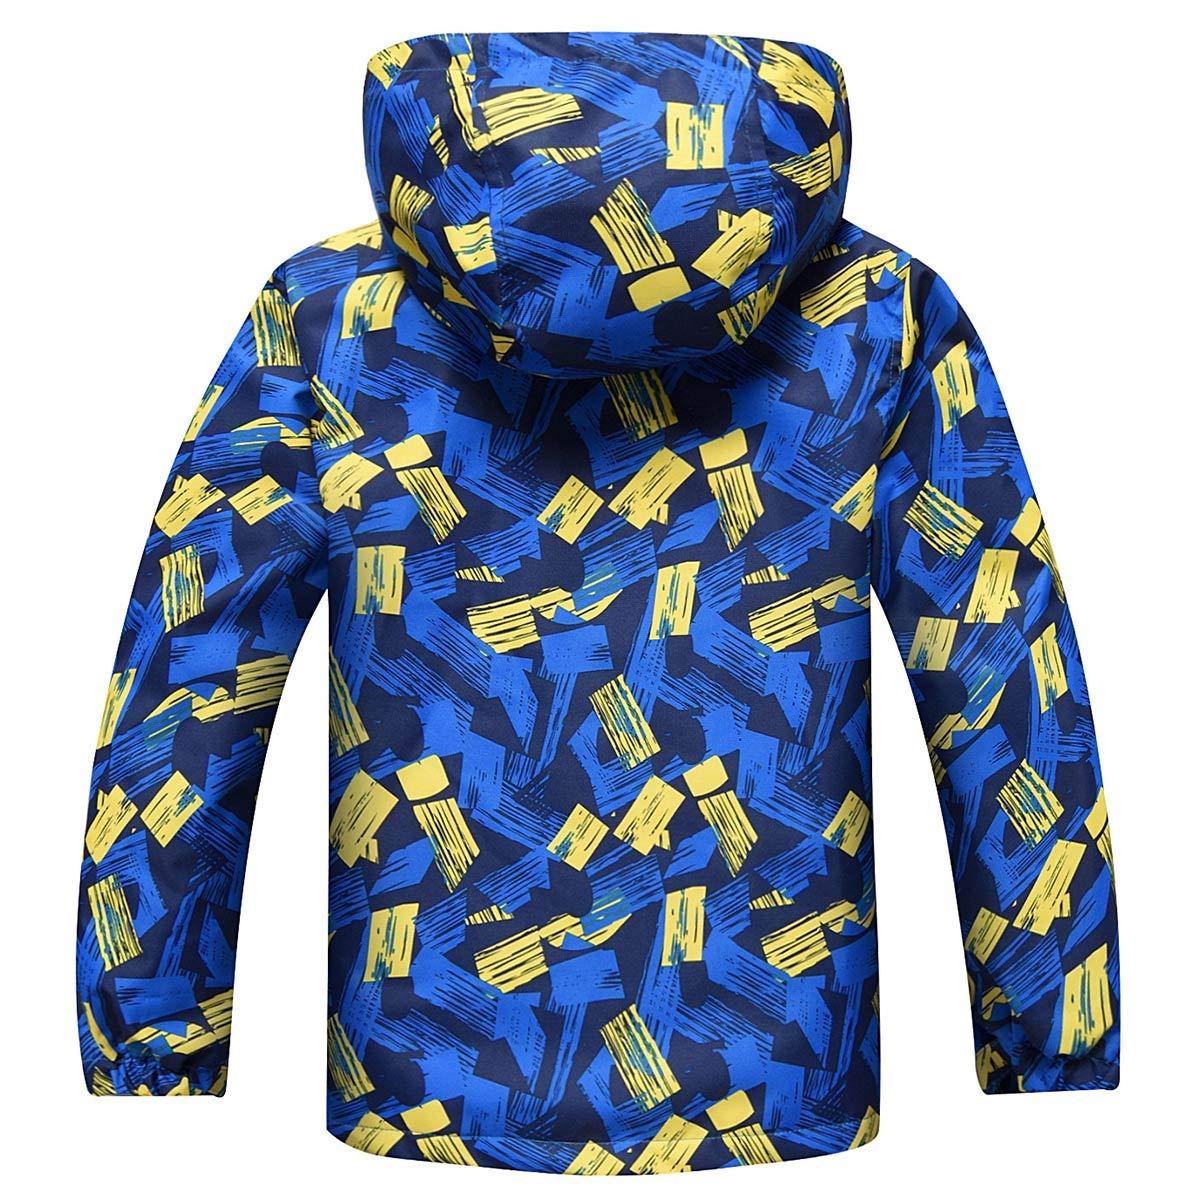 HUTUHU Latest Boys Fleece Hooded Jacket Warm Quilted Coat Outdoor Jacket